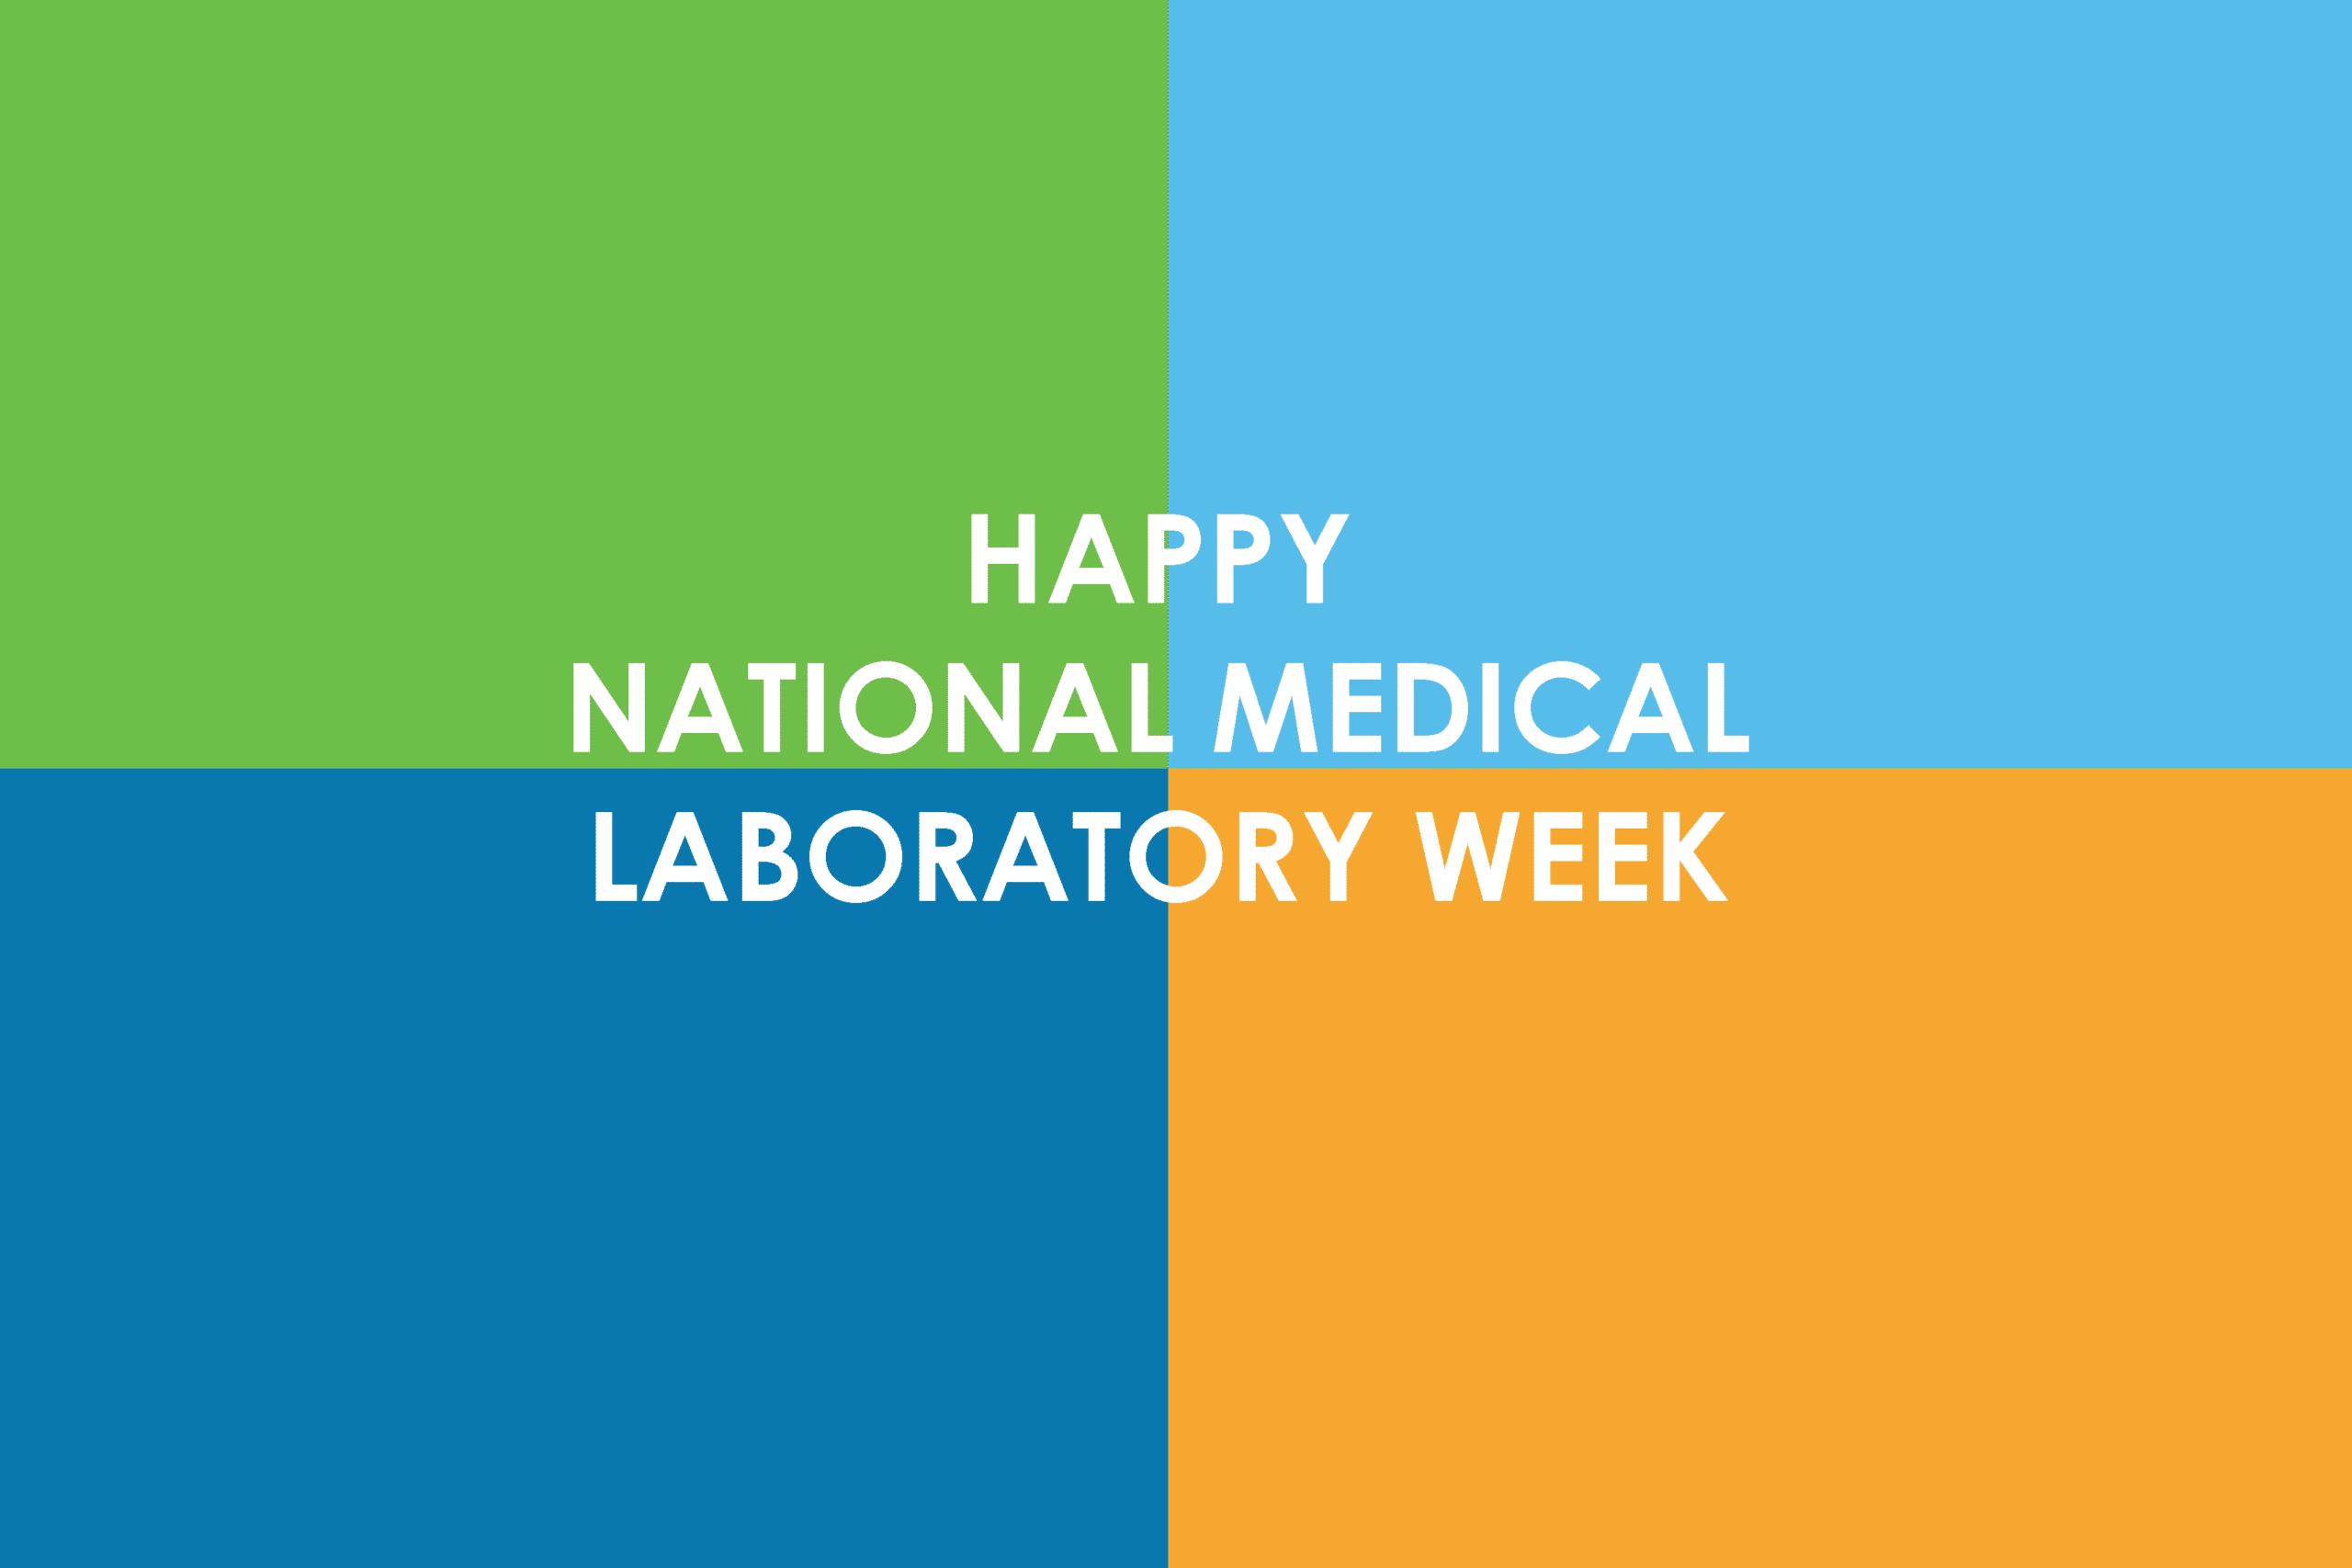 Happy National Medical Laboratory week